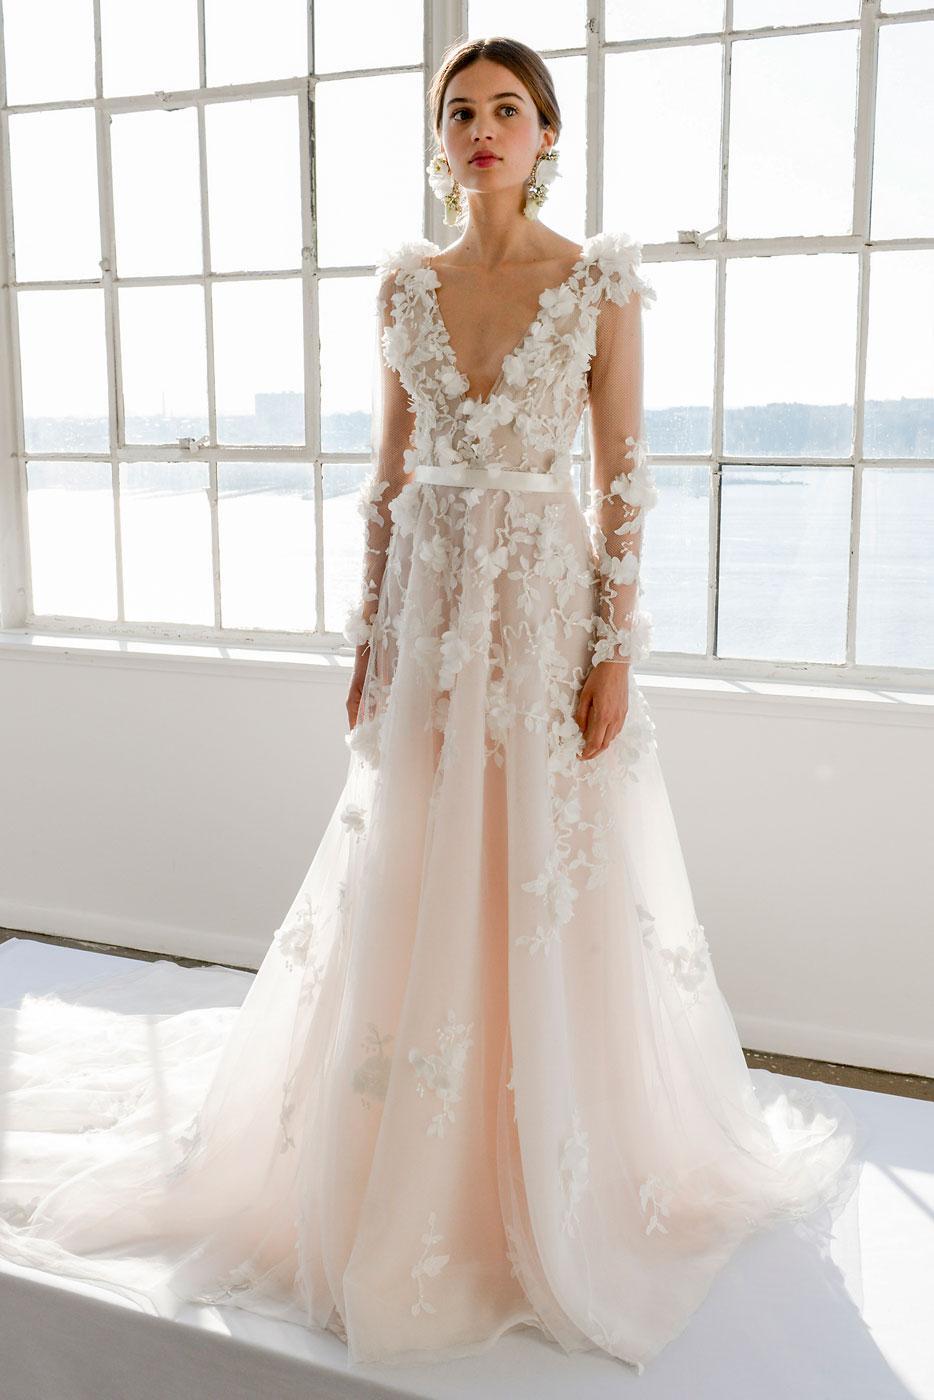 Pippa Middleton Quelle Robe Va T Elle Choisir Pour Son